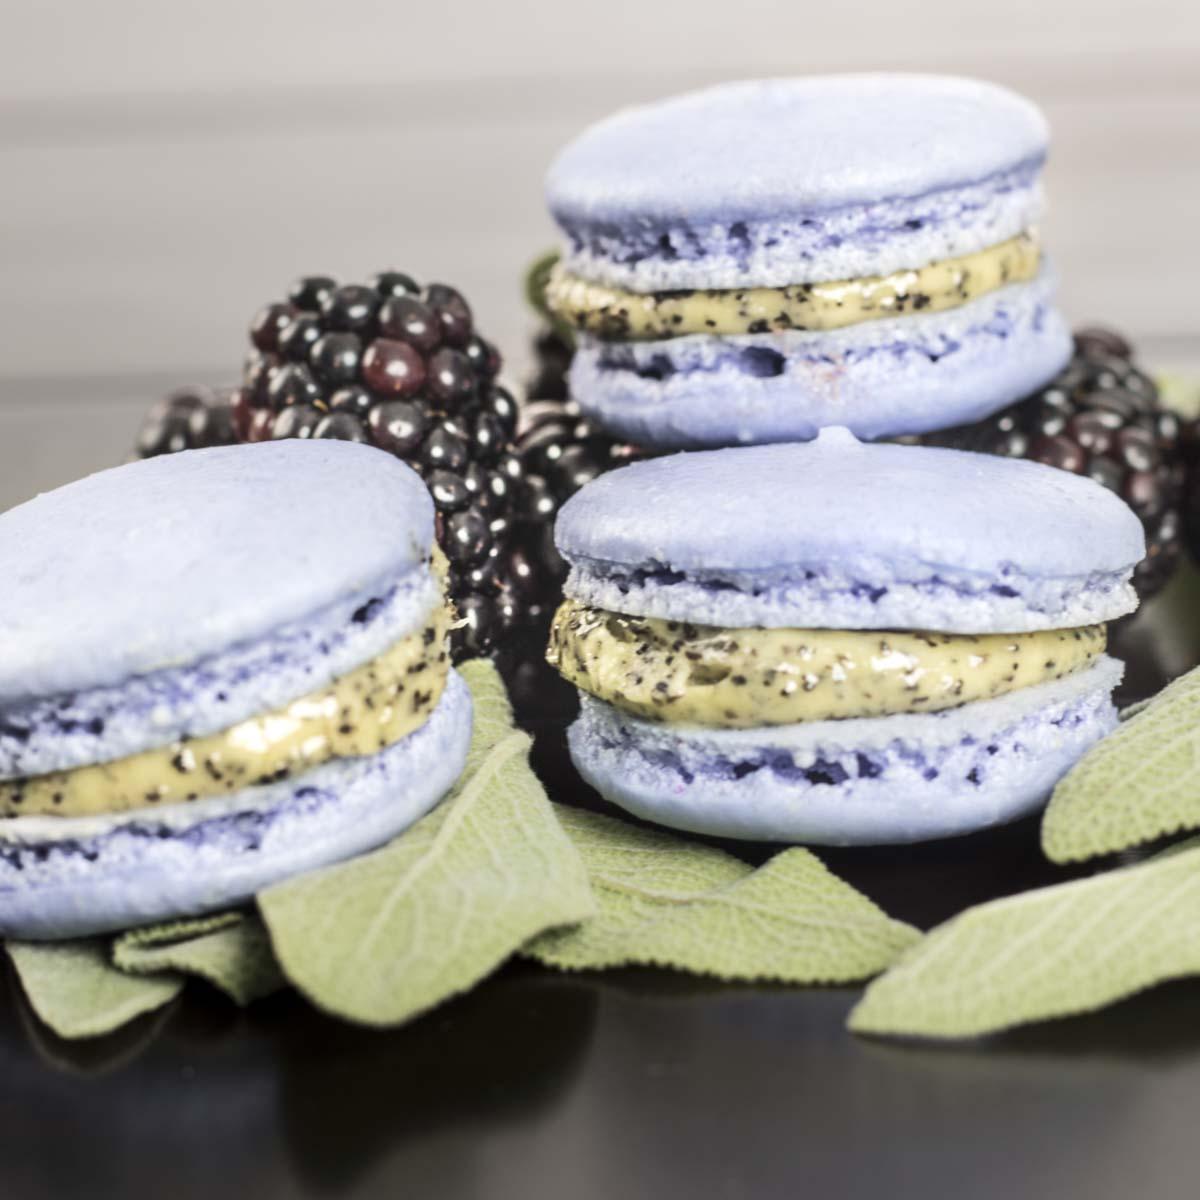 Madagascar Vanilla Bean macarons